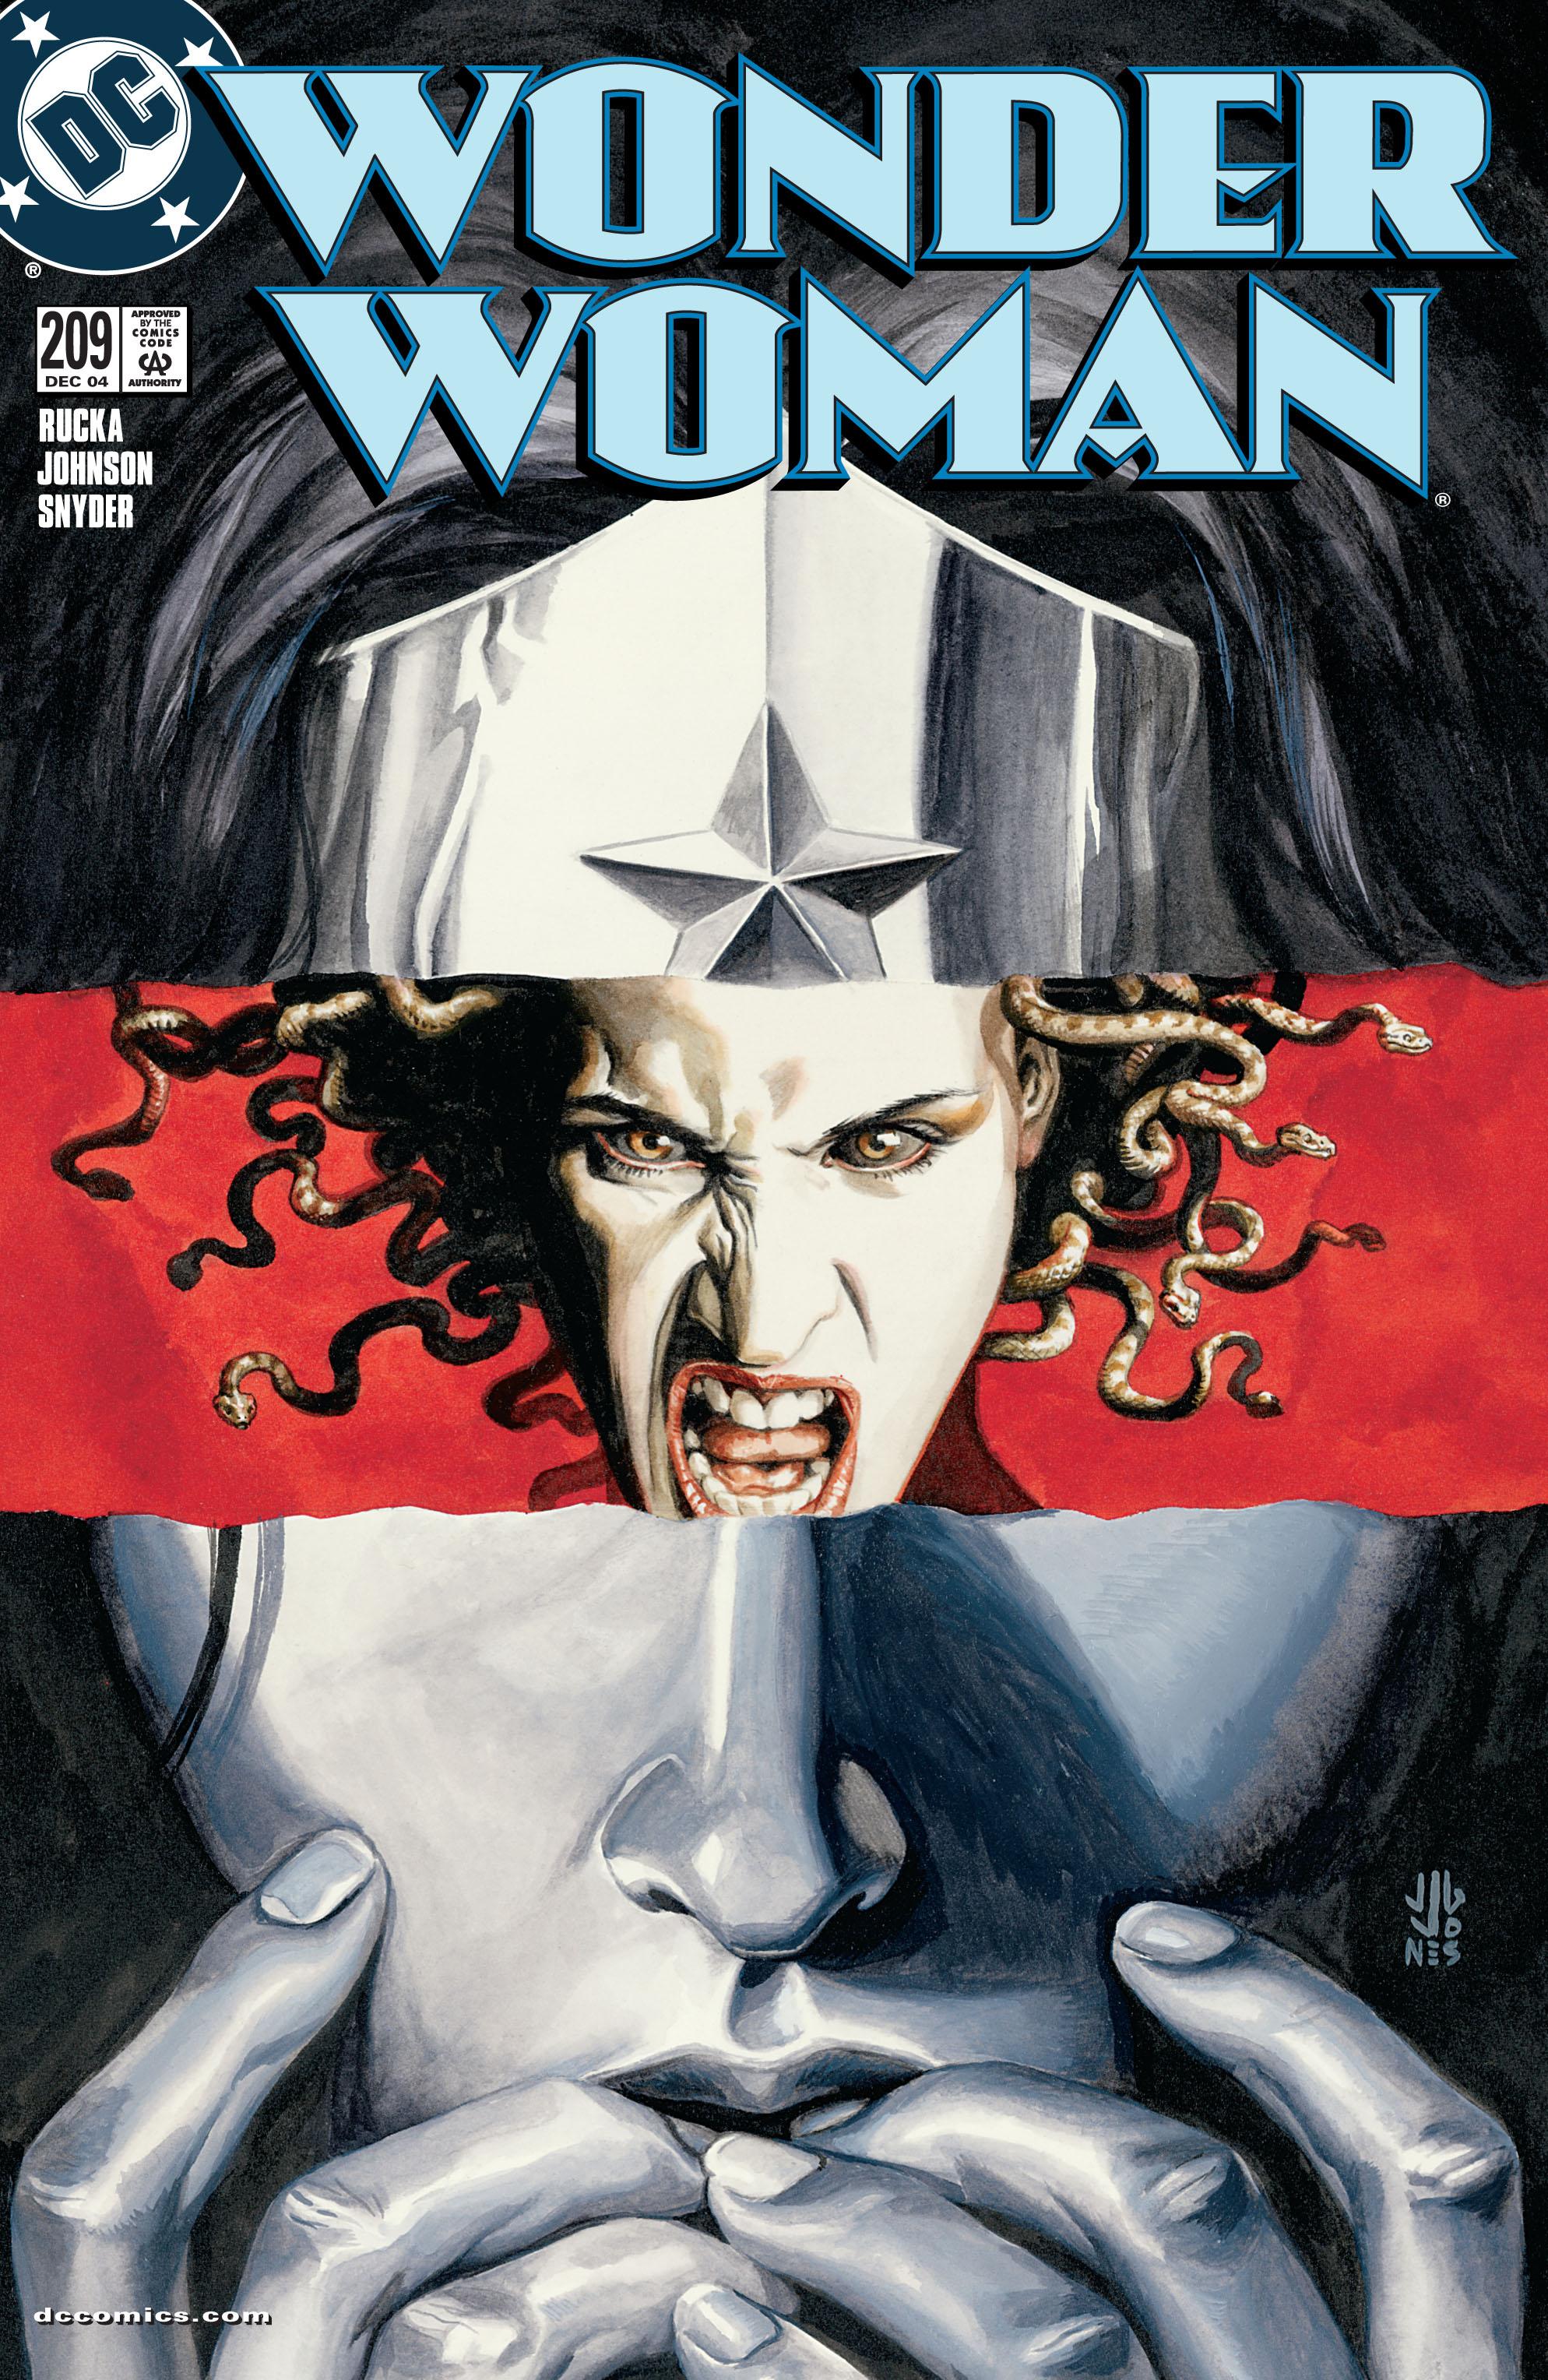 Read online Wonder Woman (1987) comic -  Issue #209 - 1